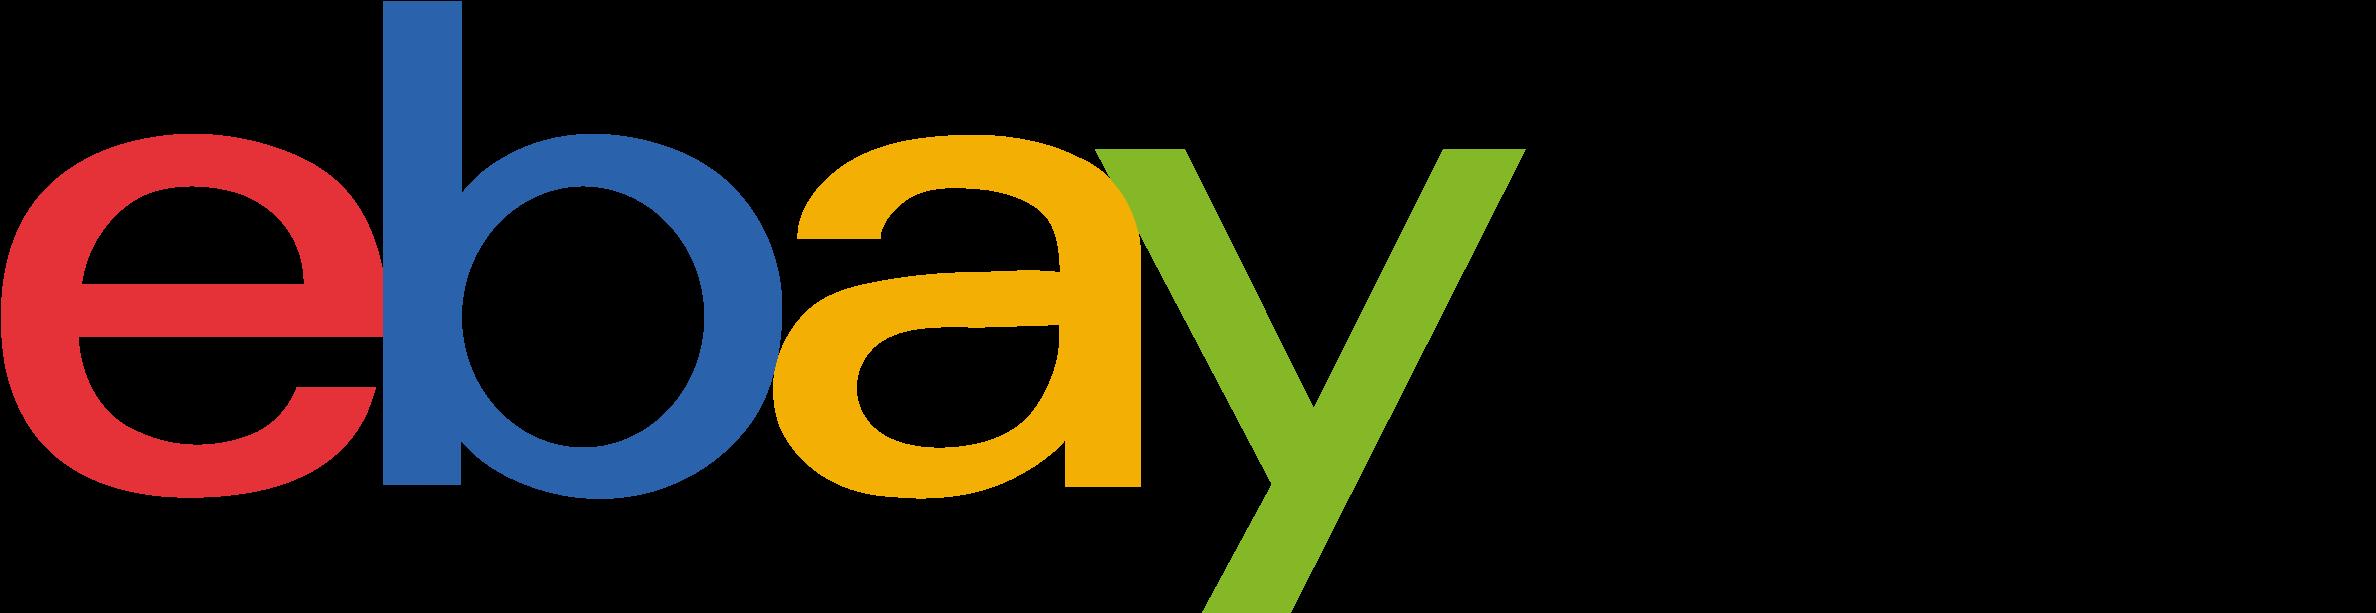 Fullmark Shop Ebay Ebay Uk Logo Clipart Full Size Clipart 4503762 Pinclipart